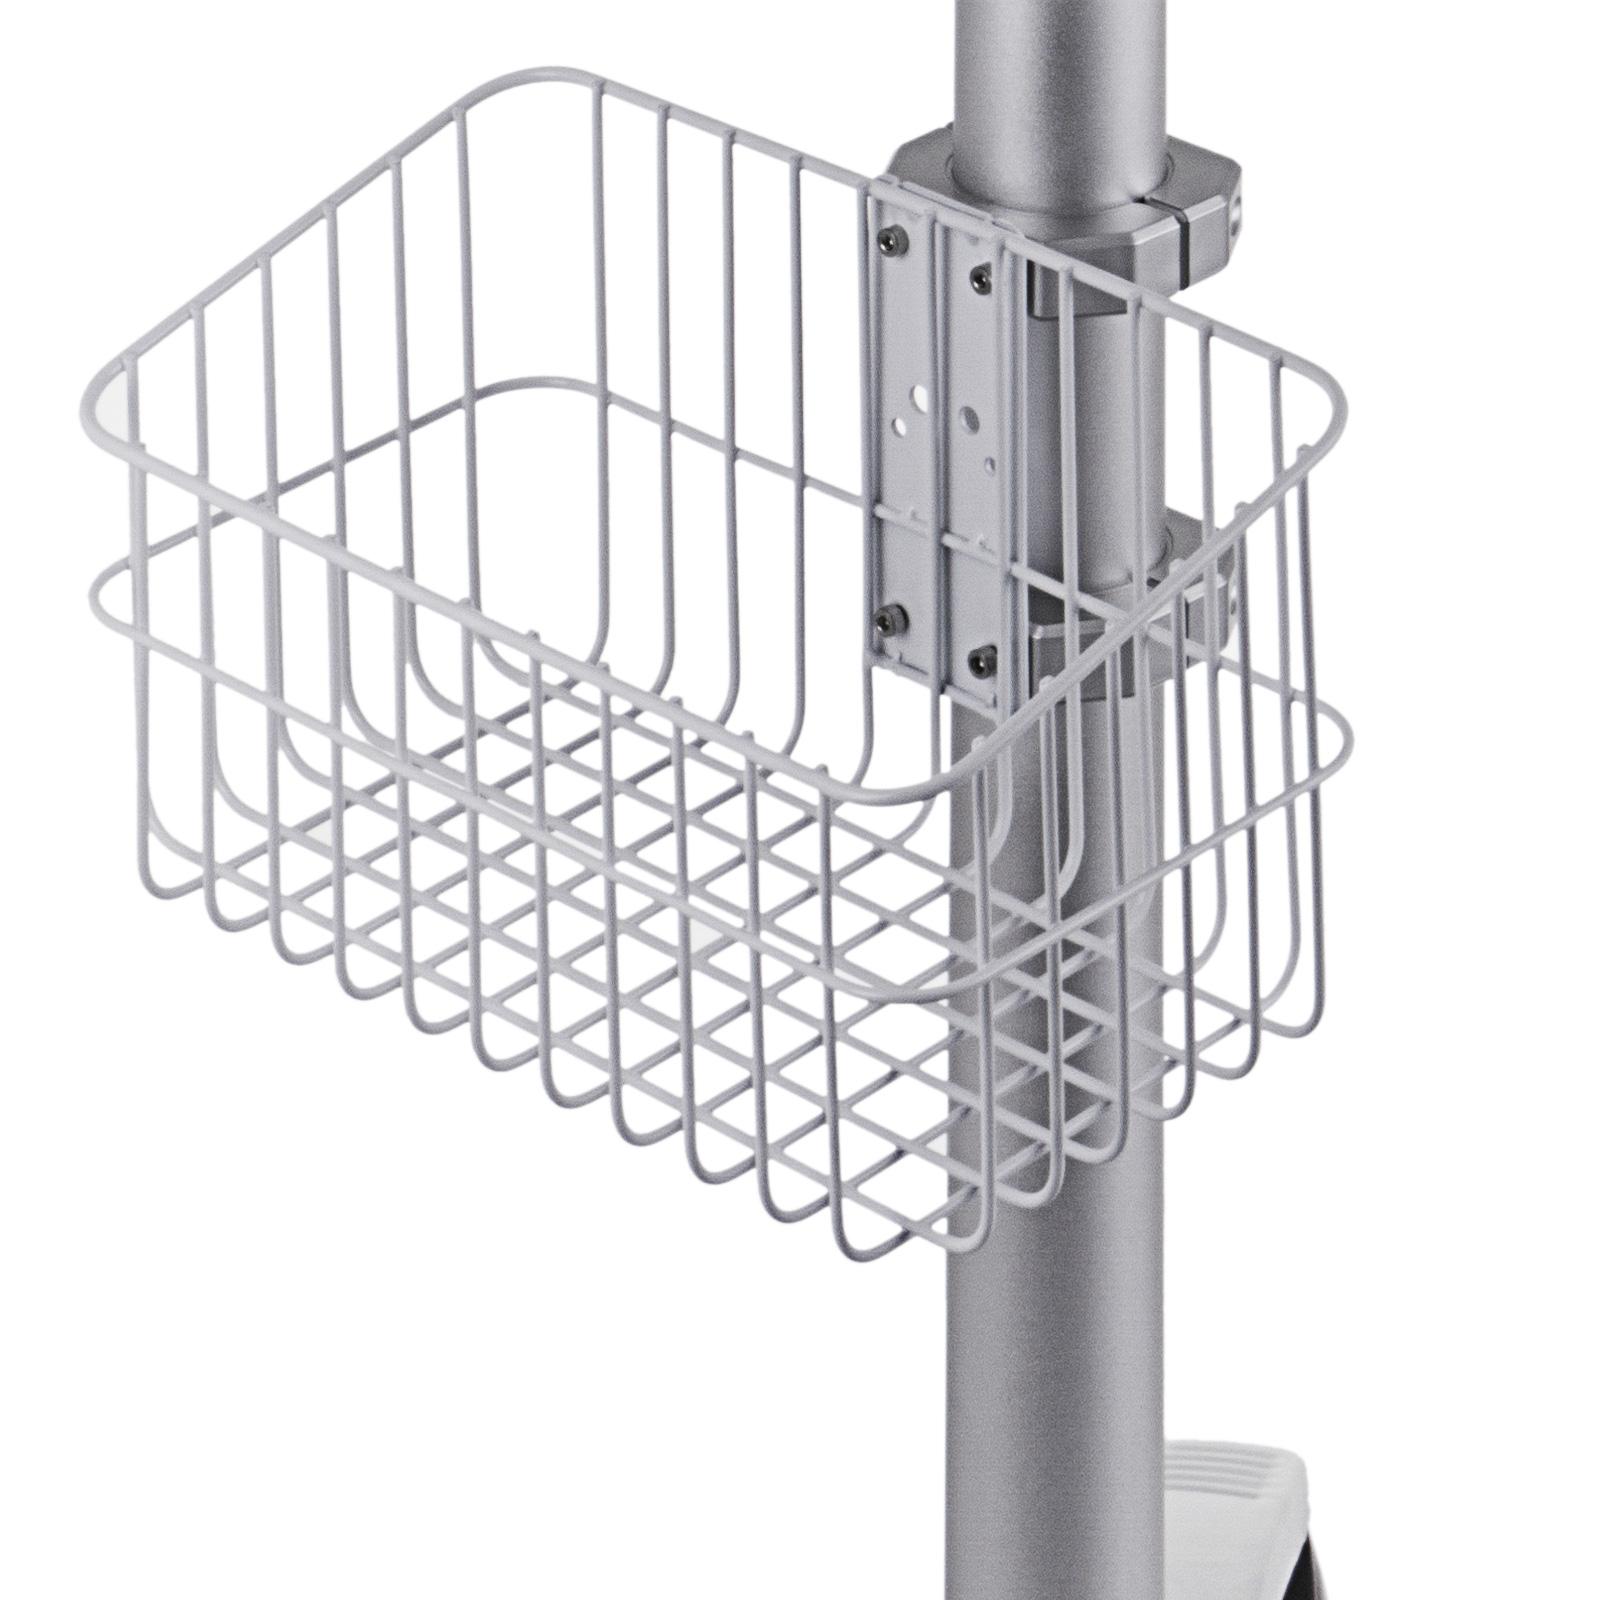 thumbnail 91 - Rolling Storage Cart Medical Salon Trolley Pedestal Rolling Cart Stainless Steel